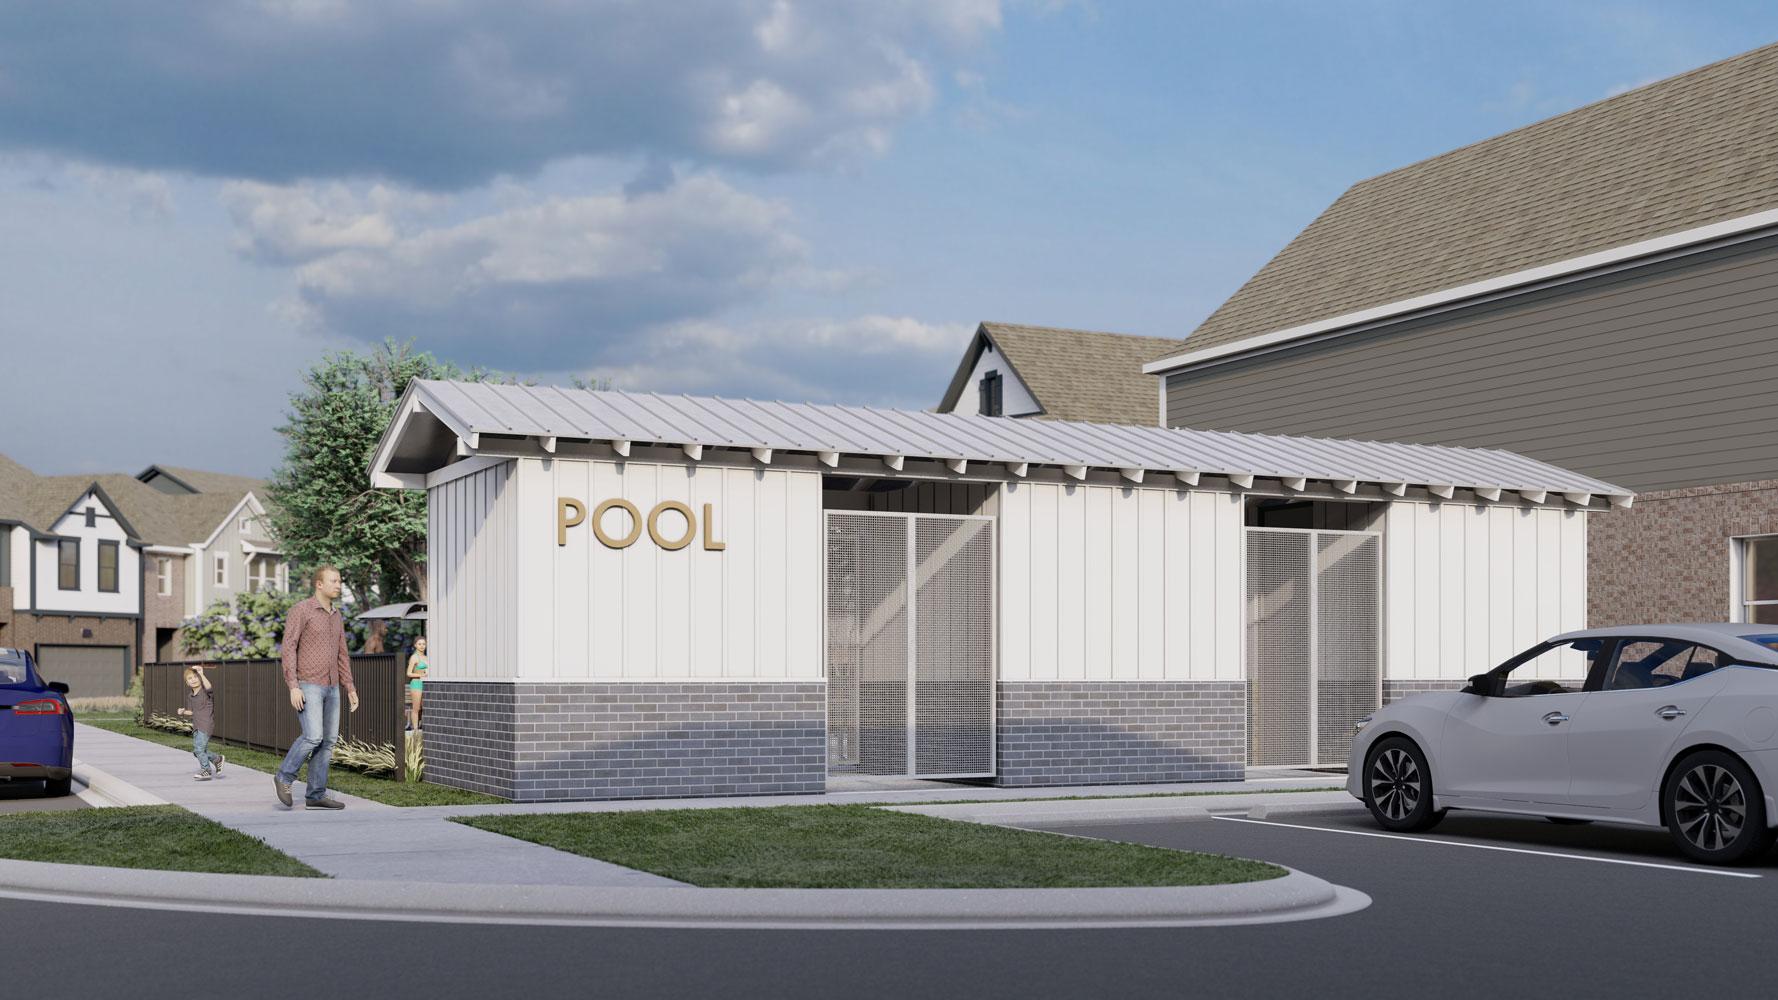 Pool House at Echelon at Reverchon Bluffs in Dallas, Texas